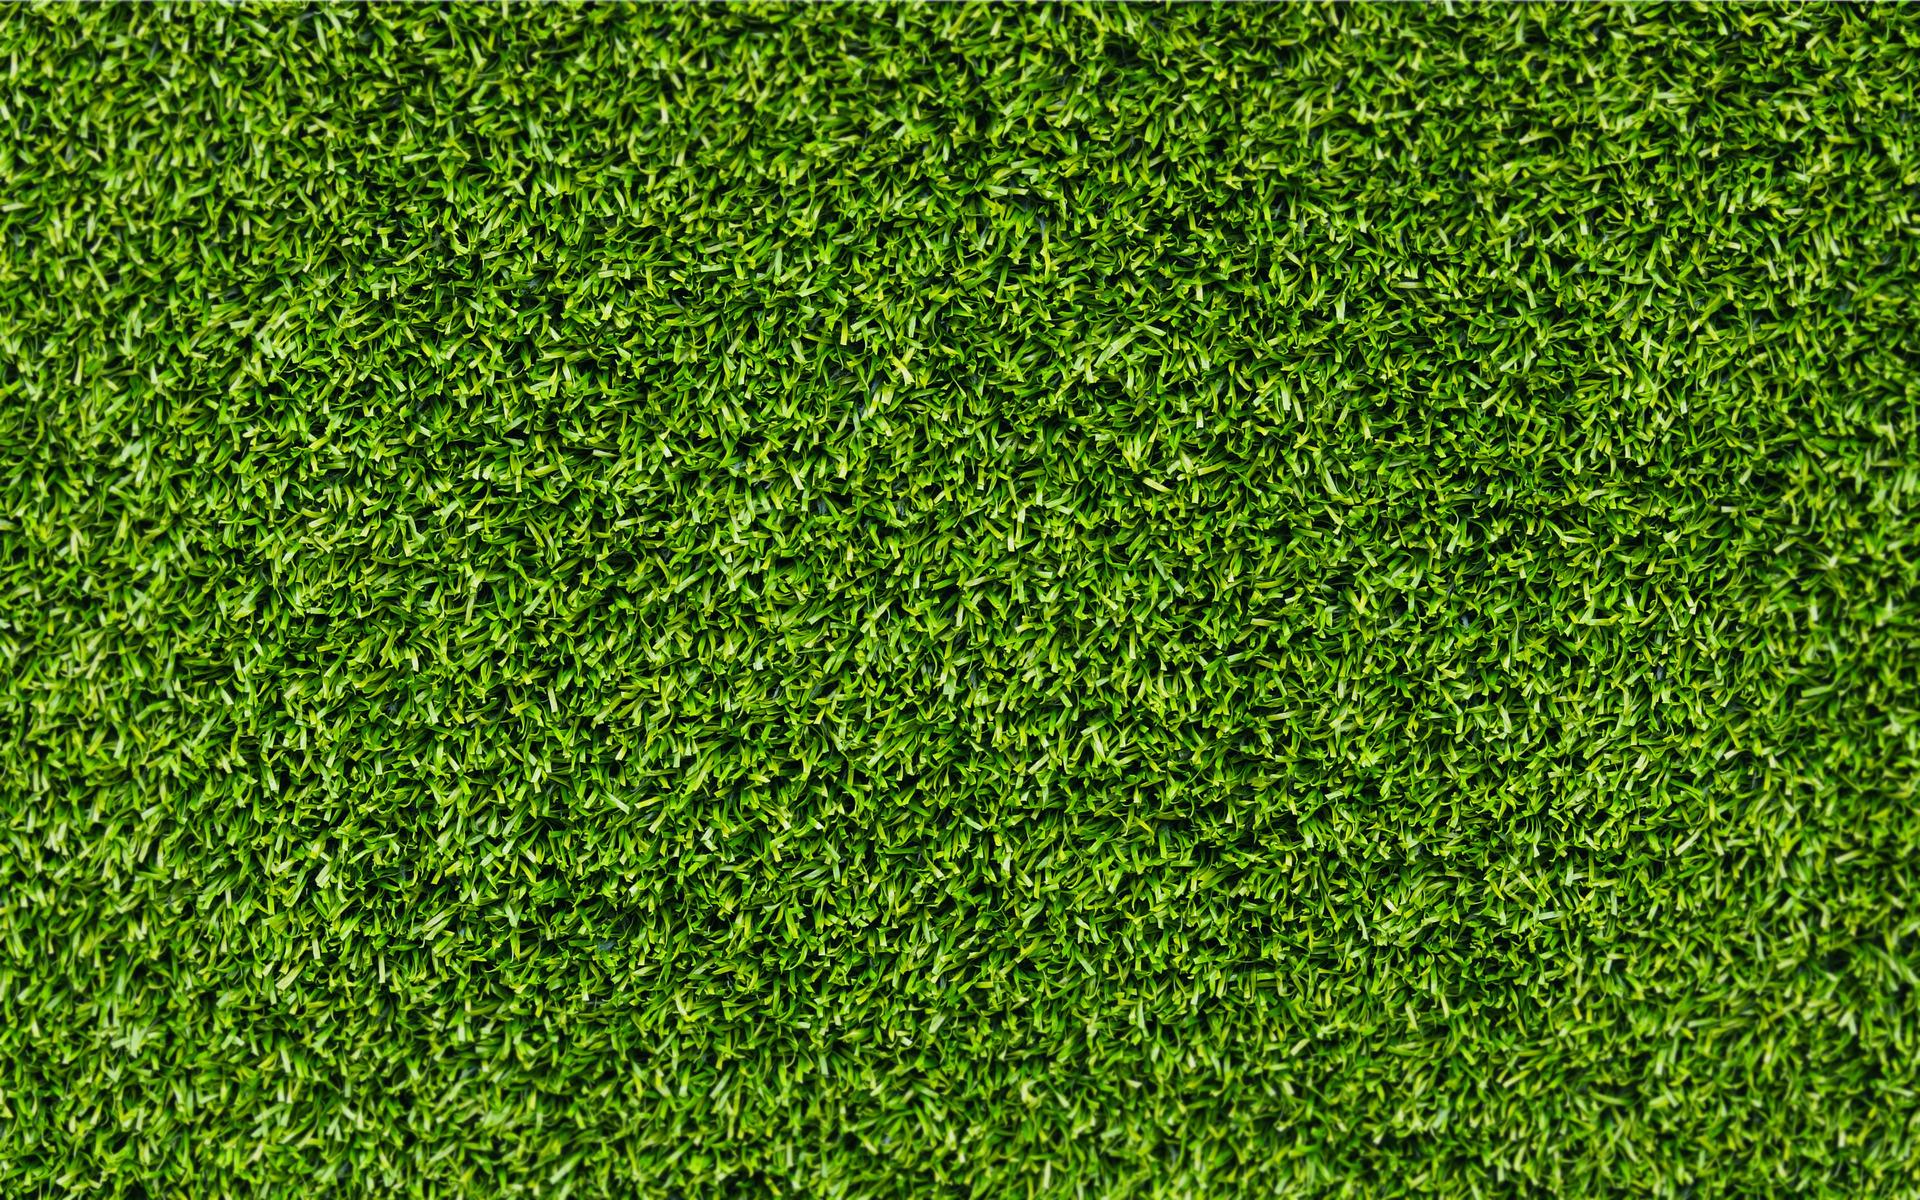 Download wallpaper: background Grass green, texture, desktop wallpapers, photo for design